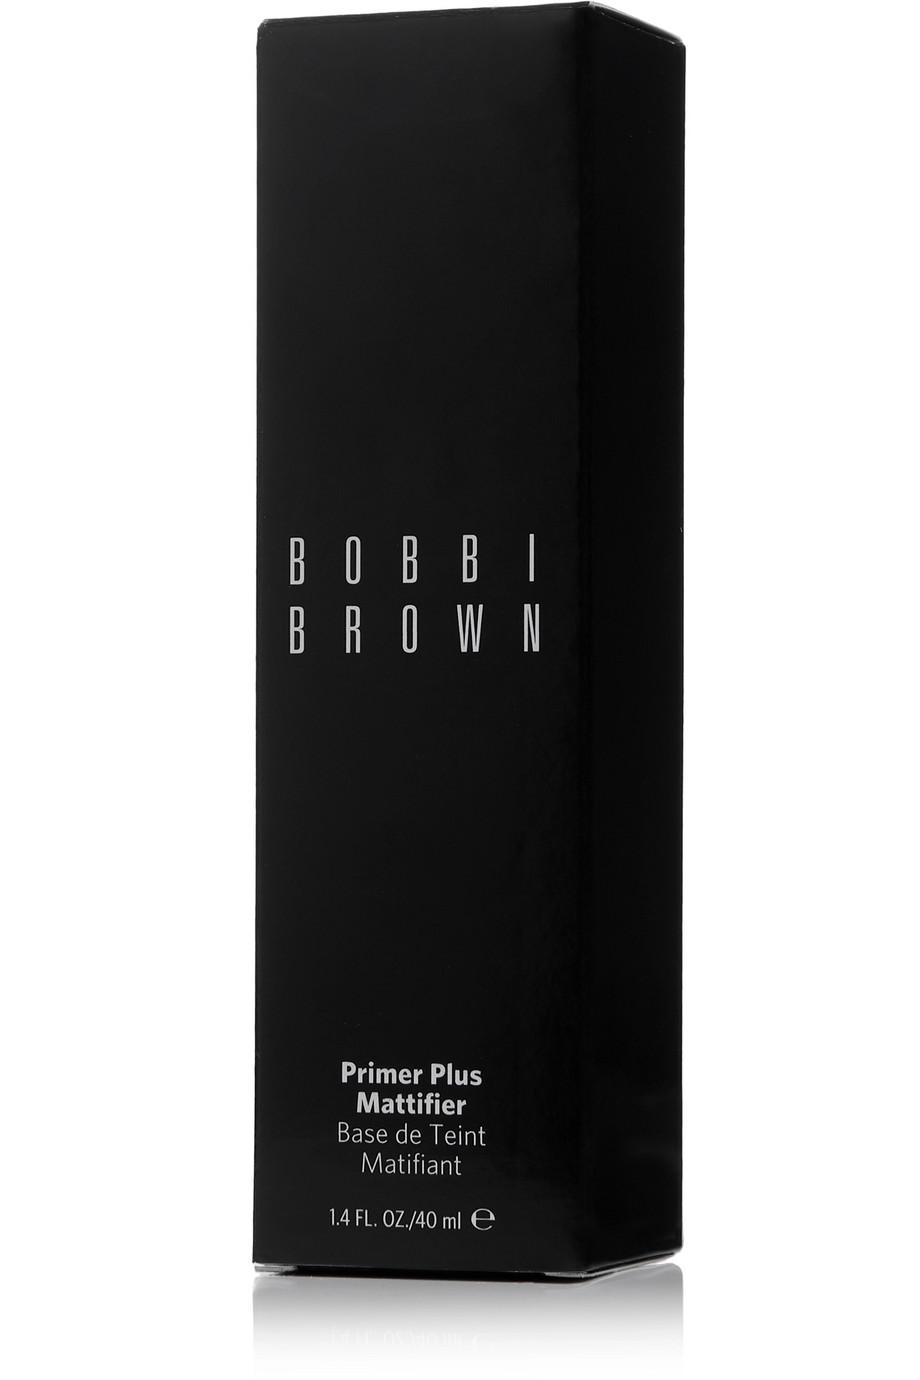 Bobbi Brown Primer Plus Mattifier, 40ml